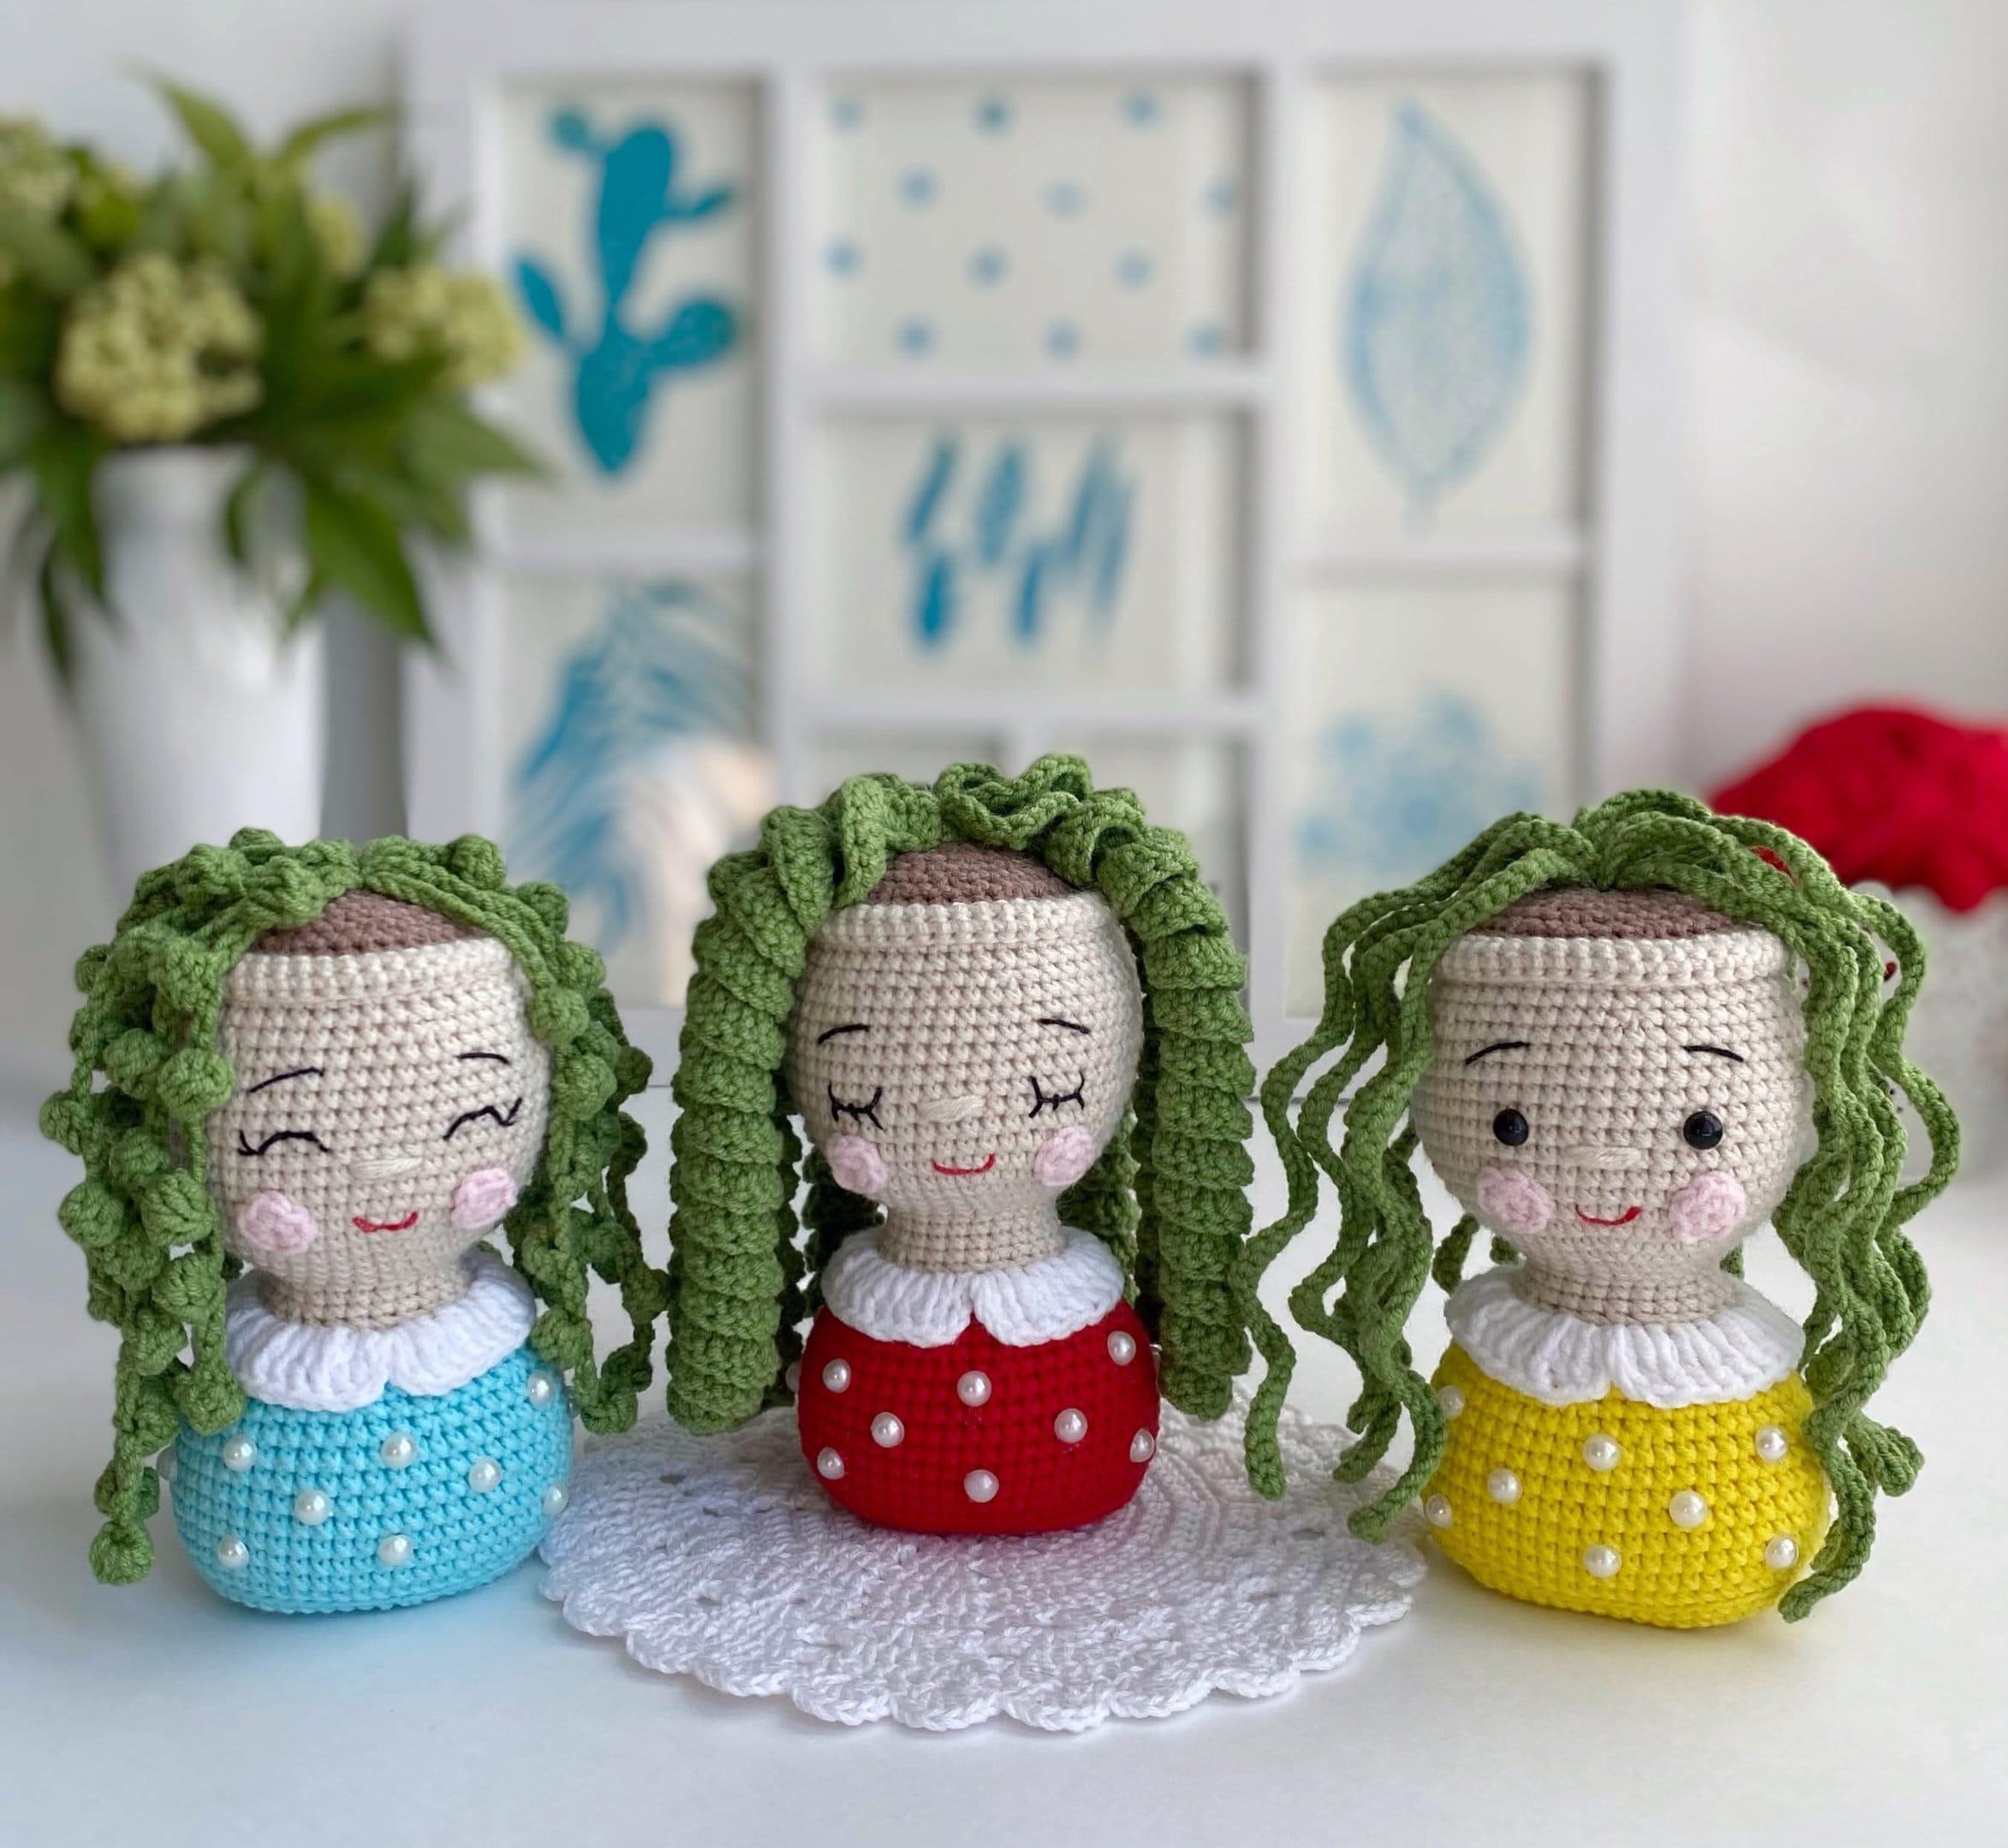 PATTERN Crochet Flower Girl Amigurumi plush plant Crochet toy string of pearls Succulent english pattern Flower in pot Crochet pot holder